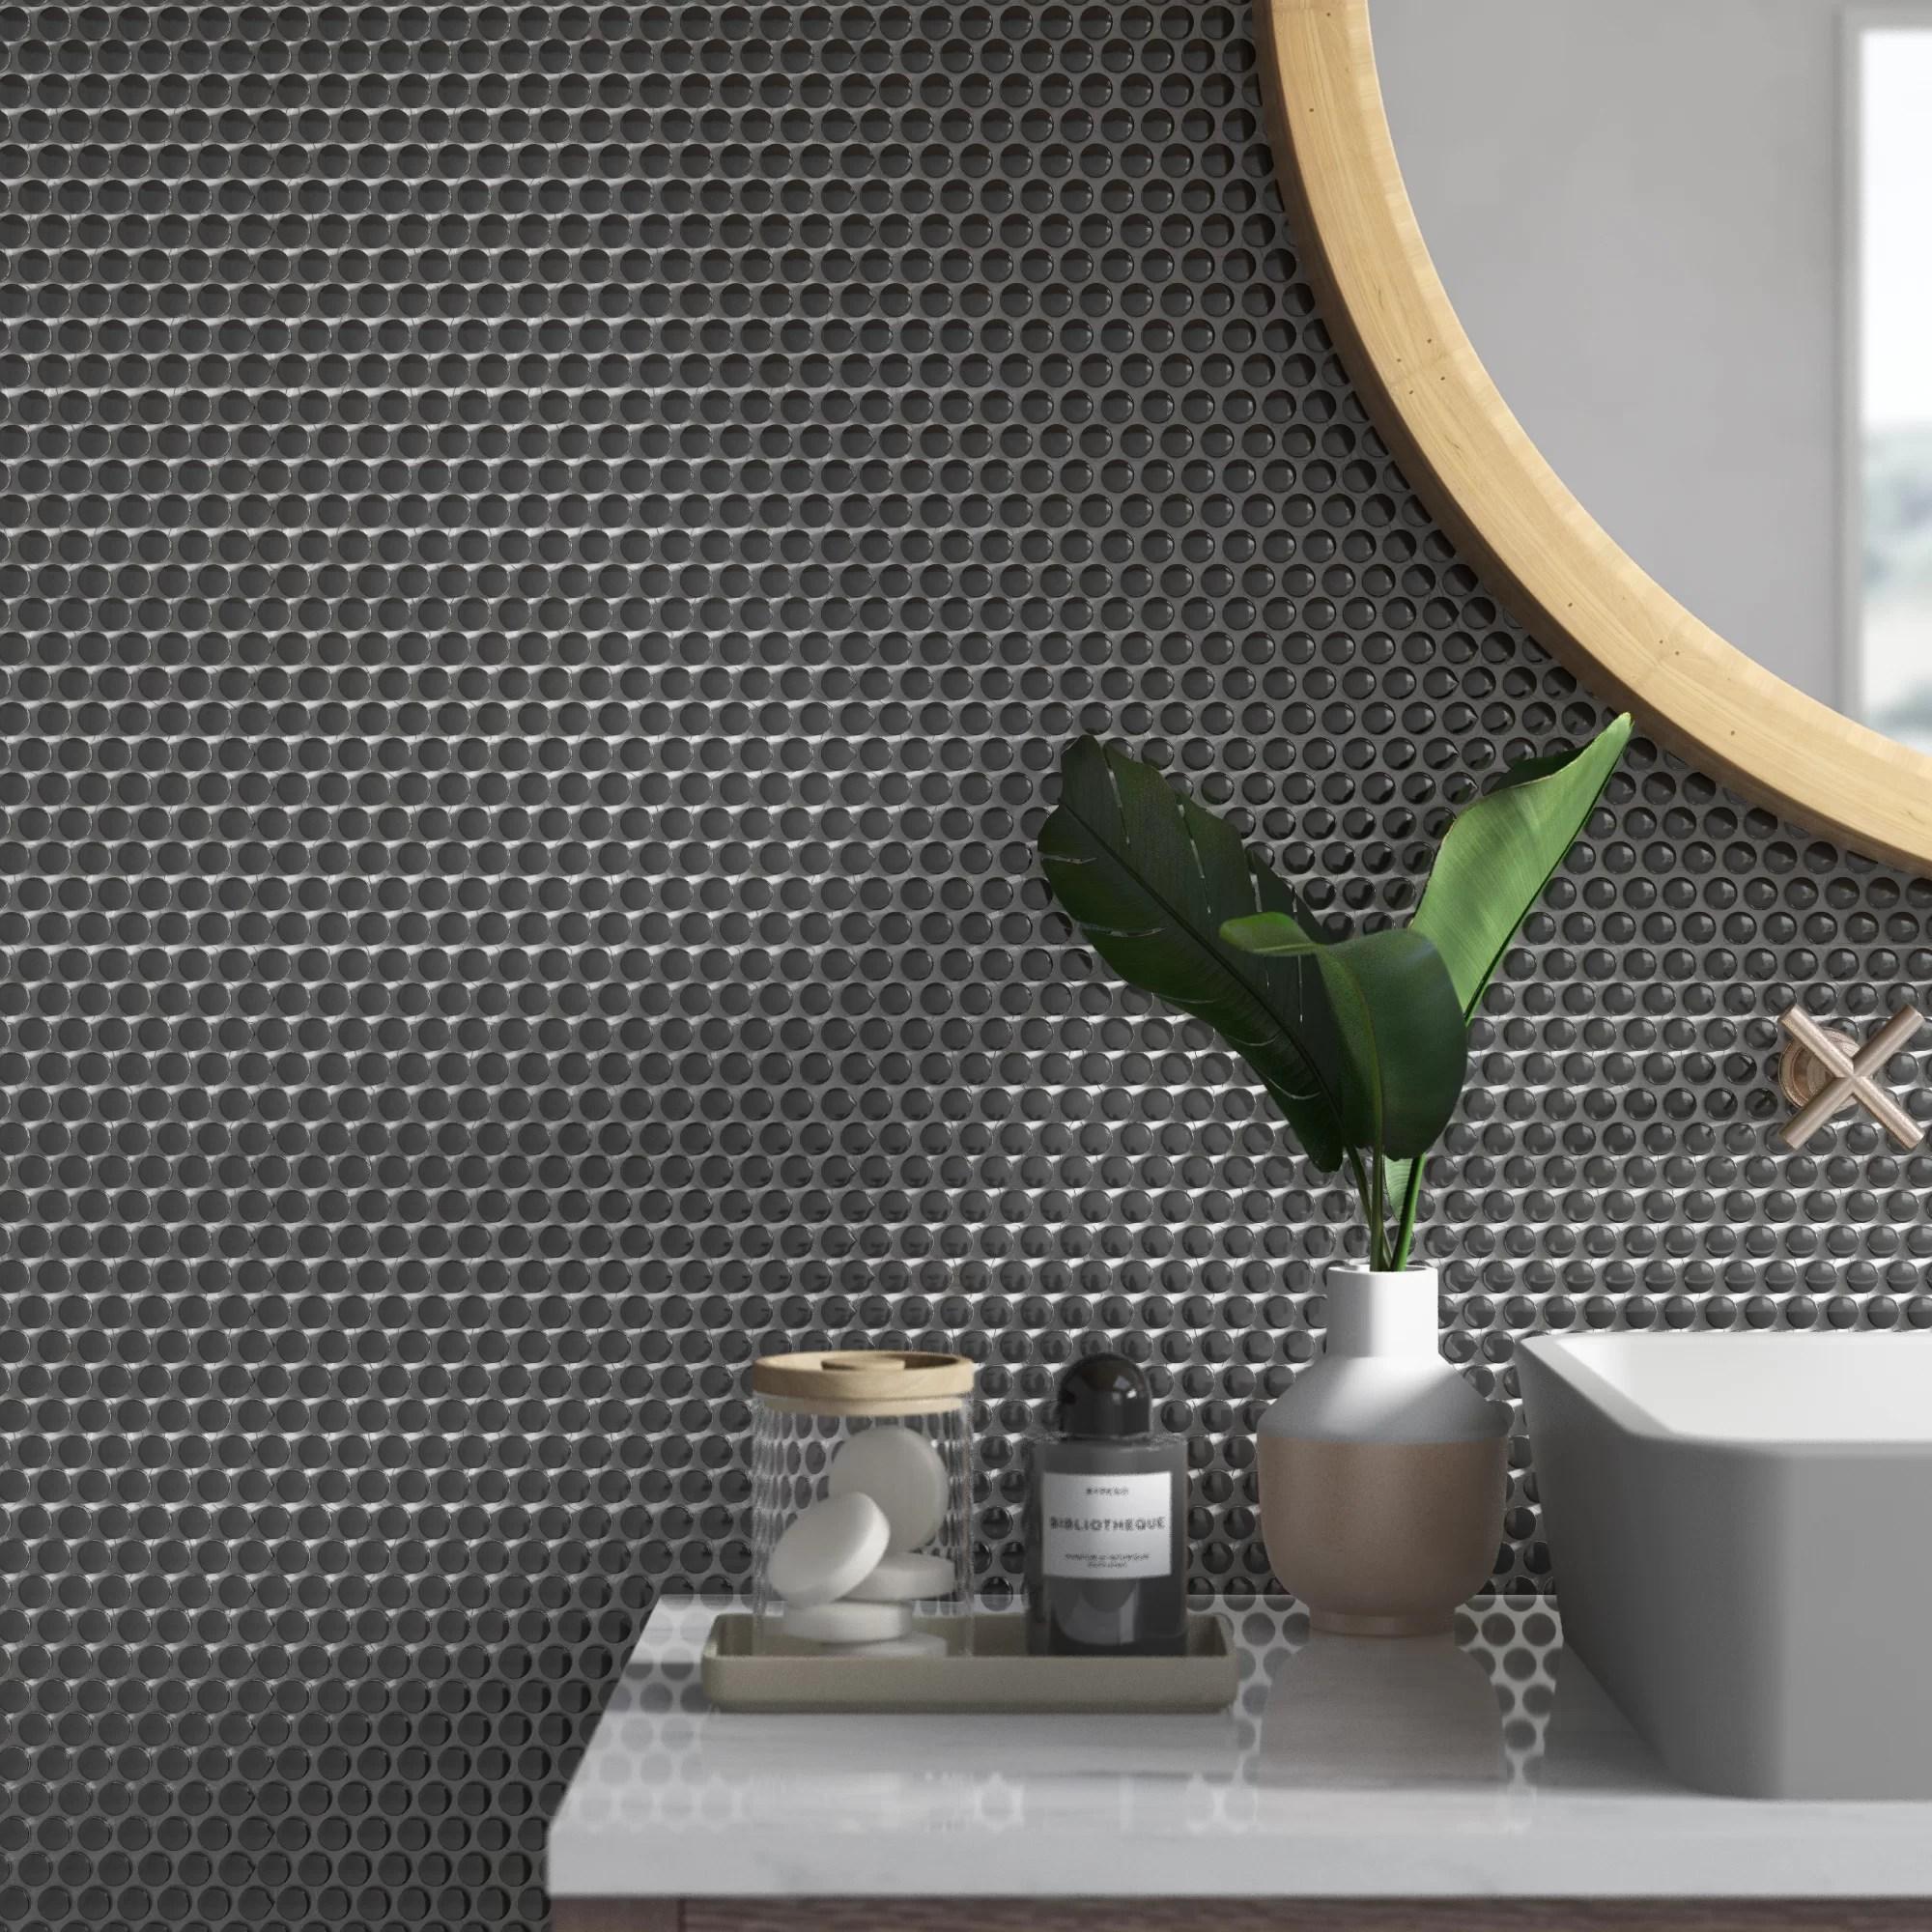 cleveland 1 x 1 porcelain mosaic tile in matte black